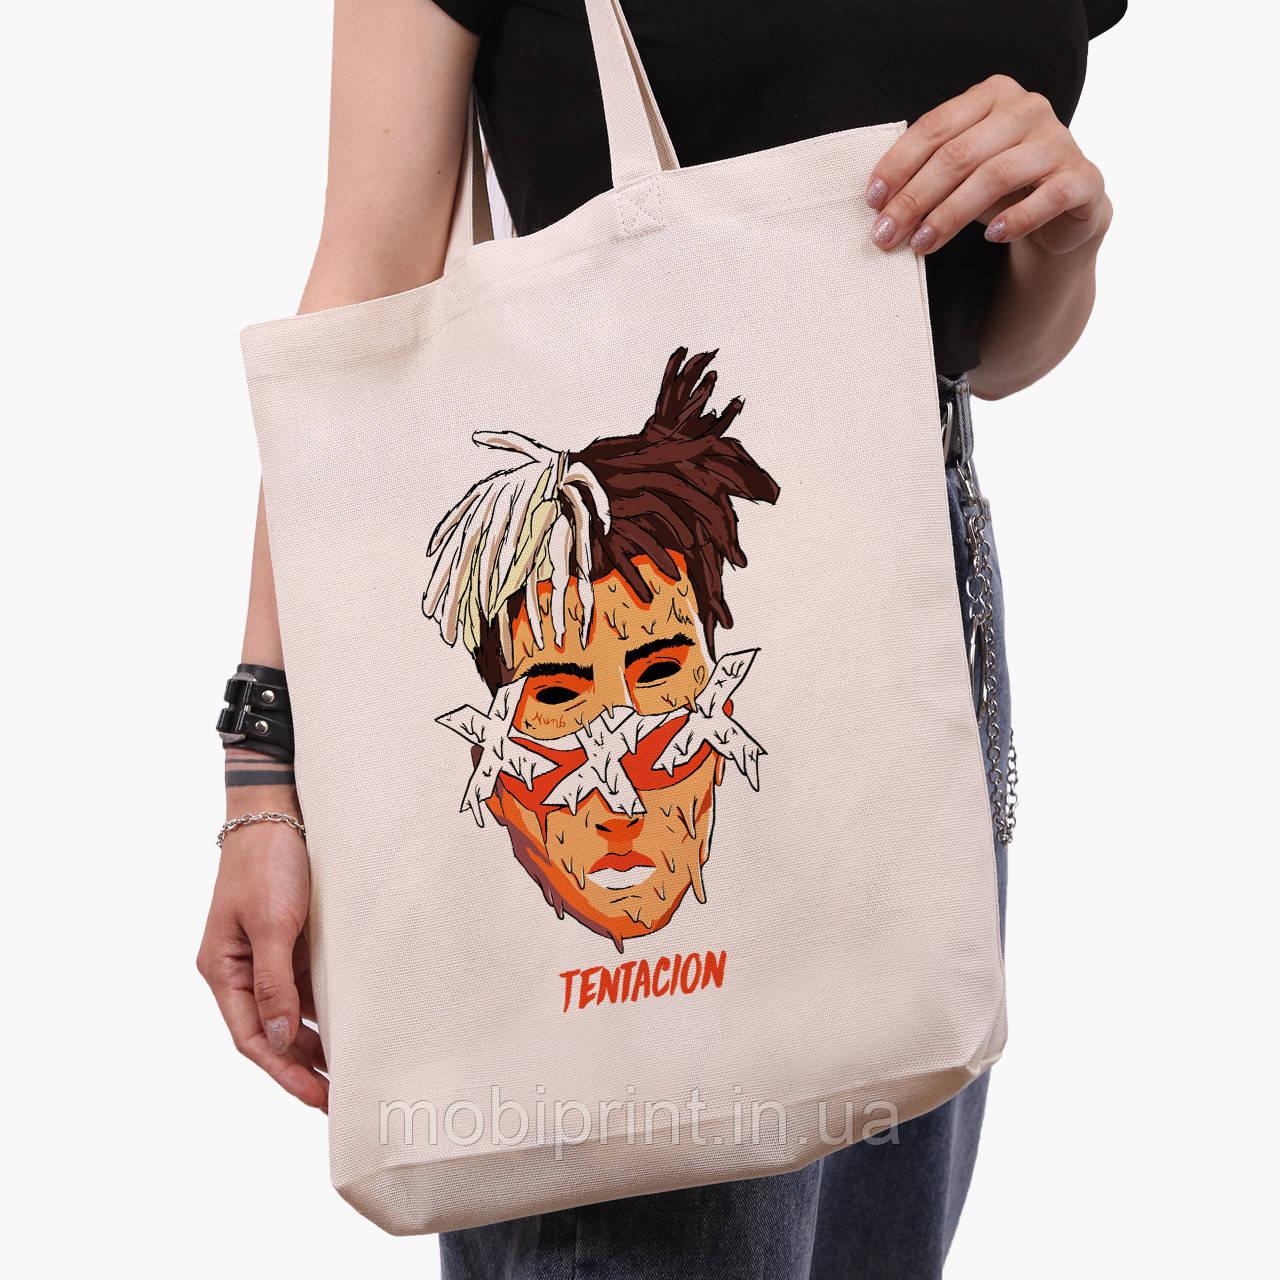 Еко сумка шоппер біла Екс-екс-екс Тентасьон (XXXTentacion) (9227-2636-1) 41*39*8 см